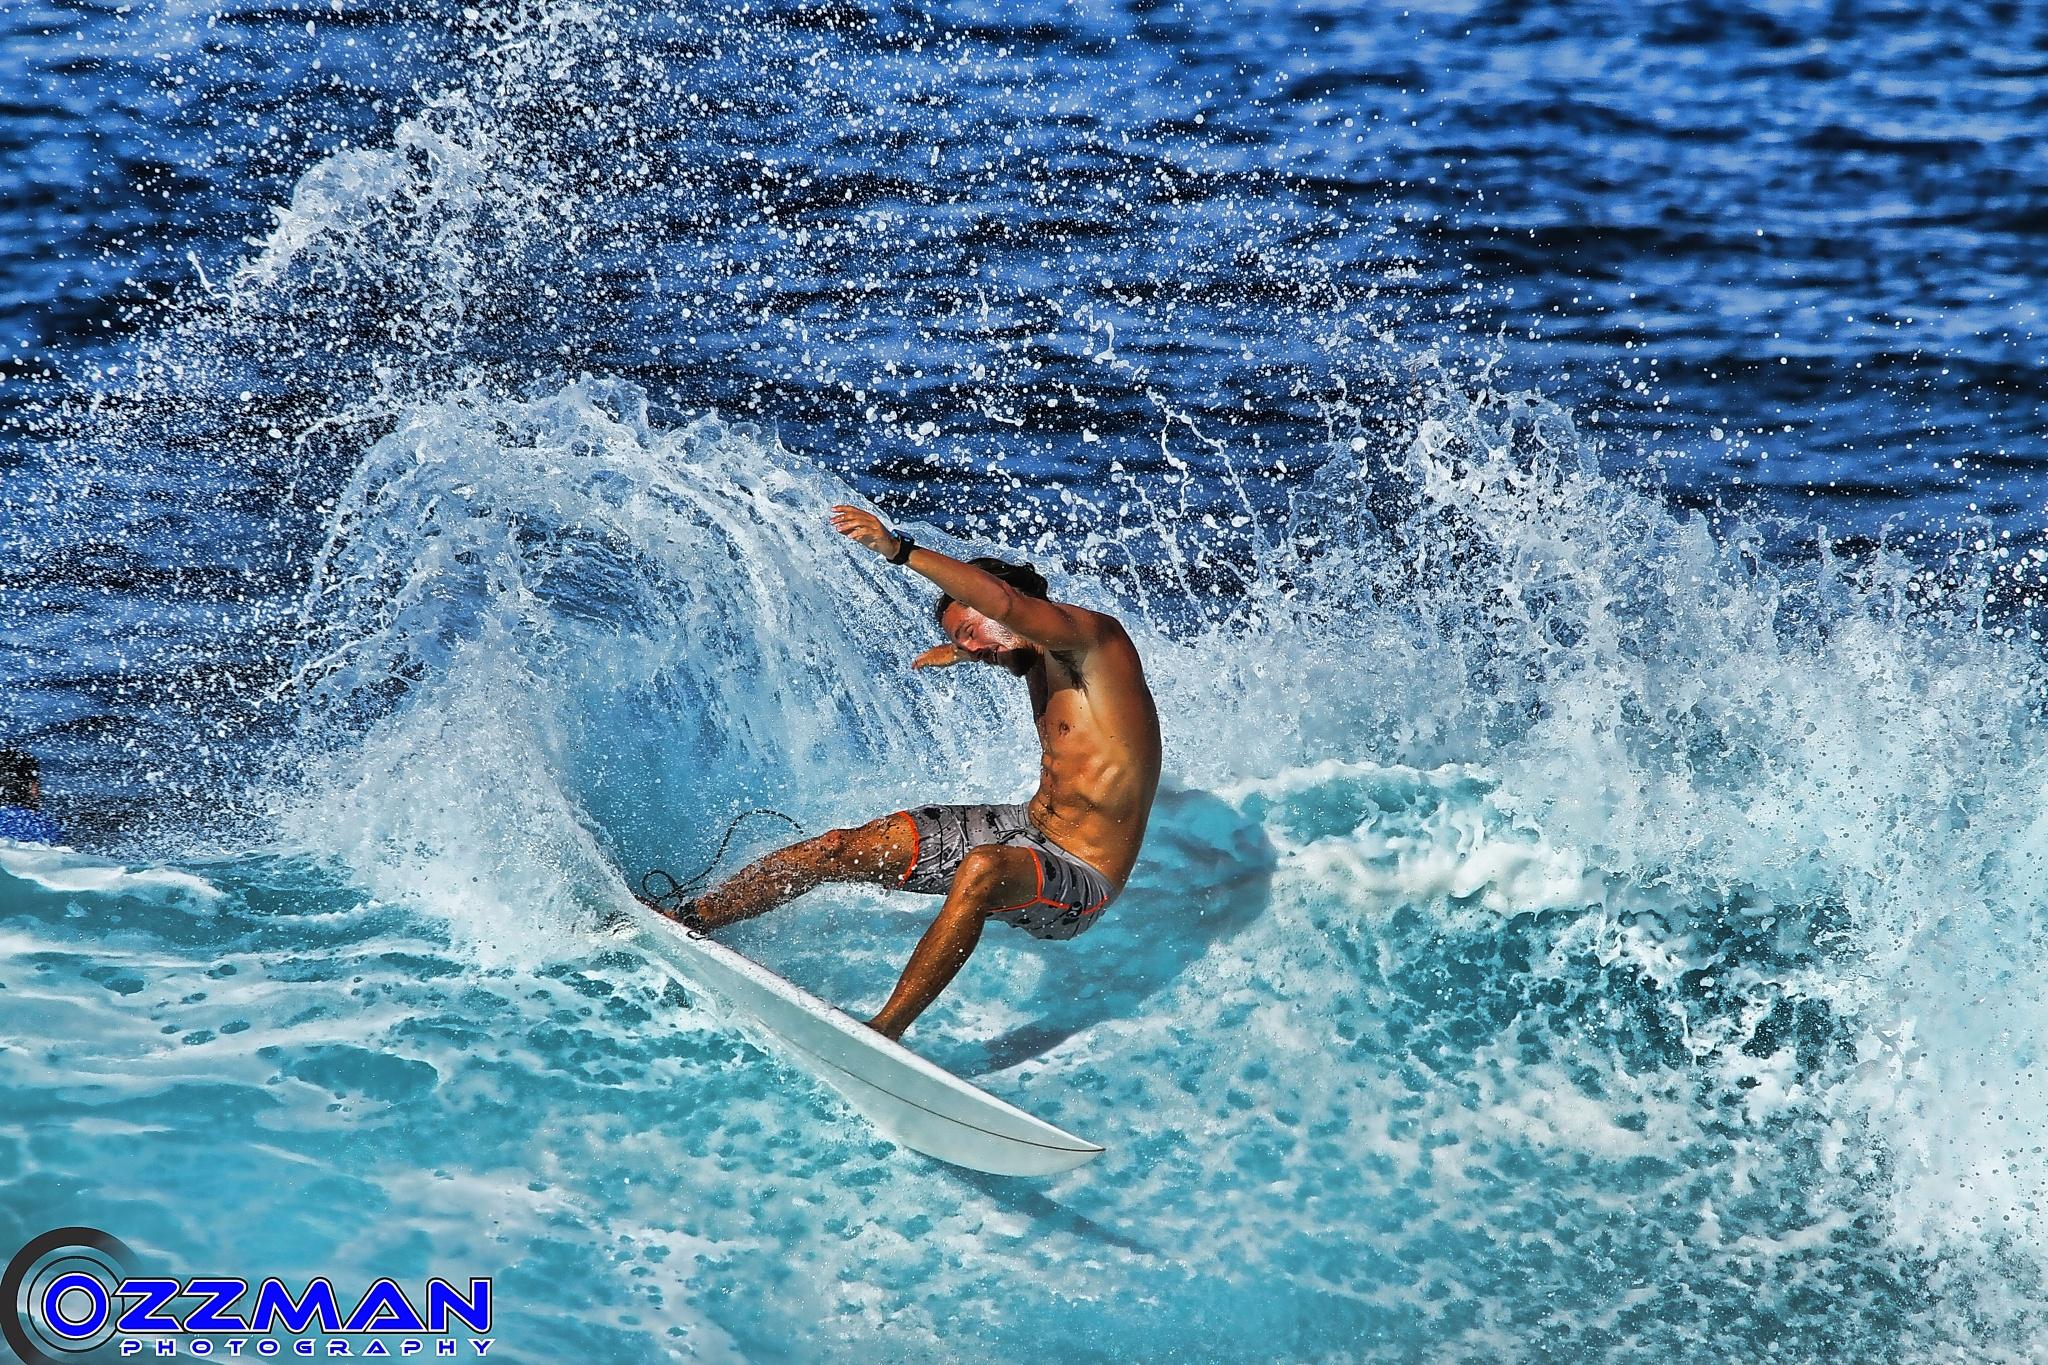 Surfer #4 by Ozzy Osborne